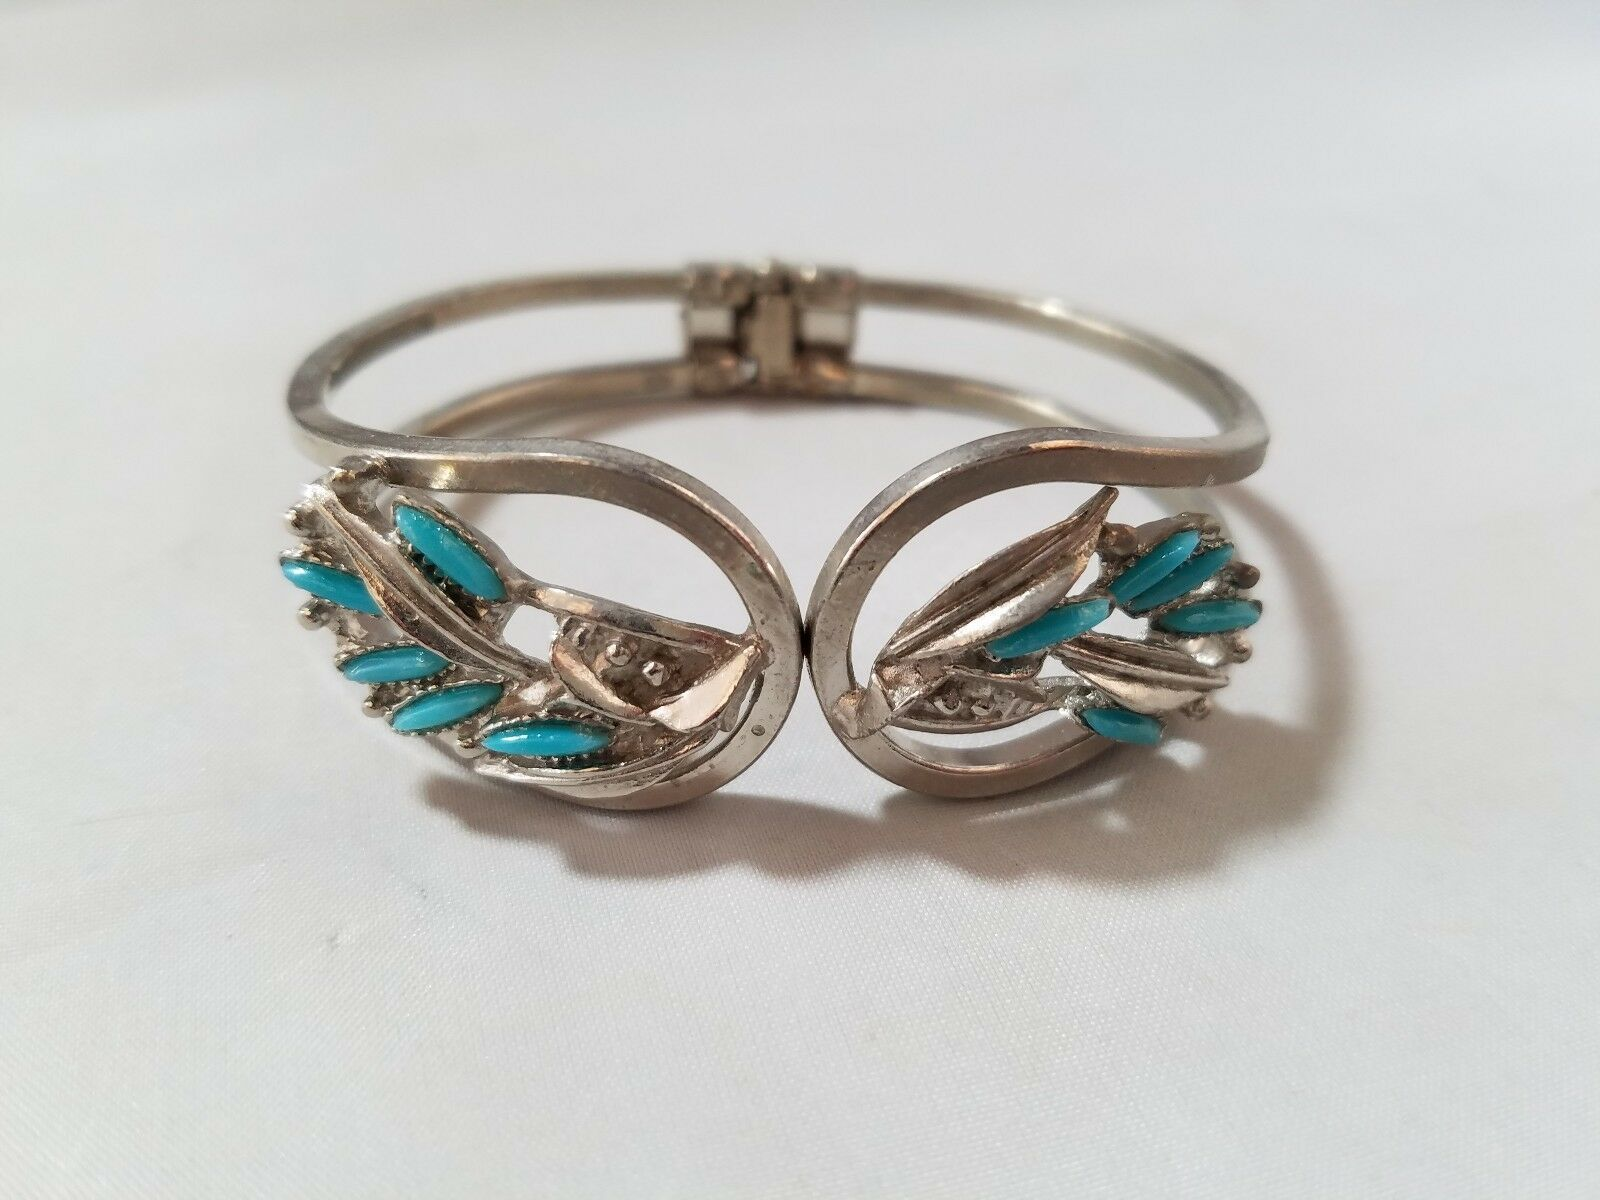 Vintage Fashion Jewelry Set Silver Tone Turquoise Bracelet Bangle & Earrings